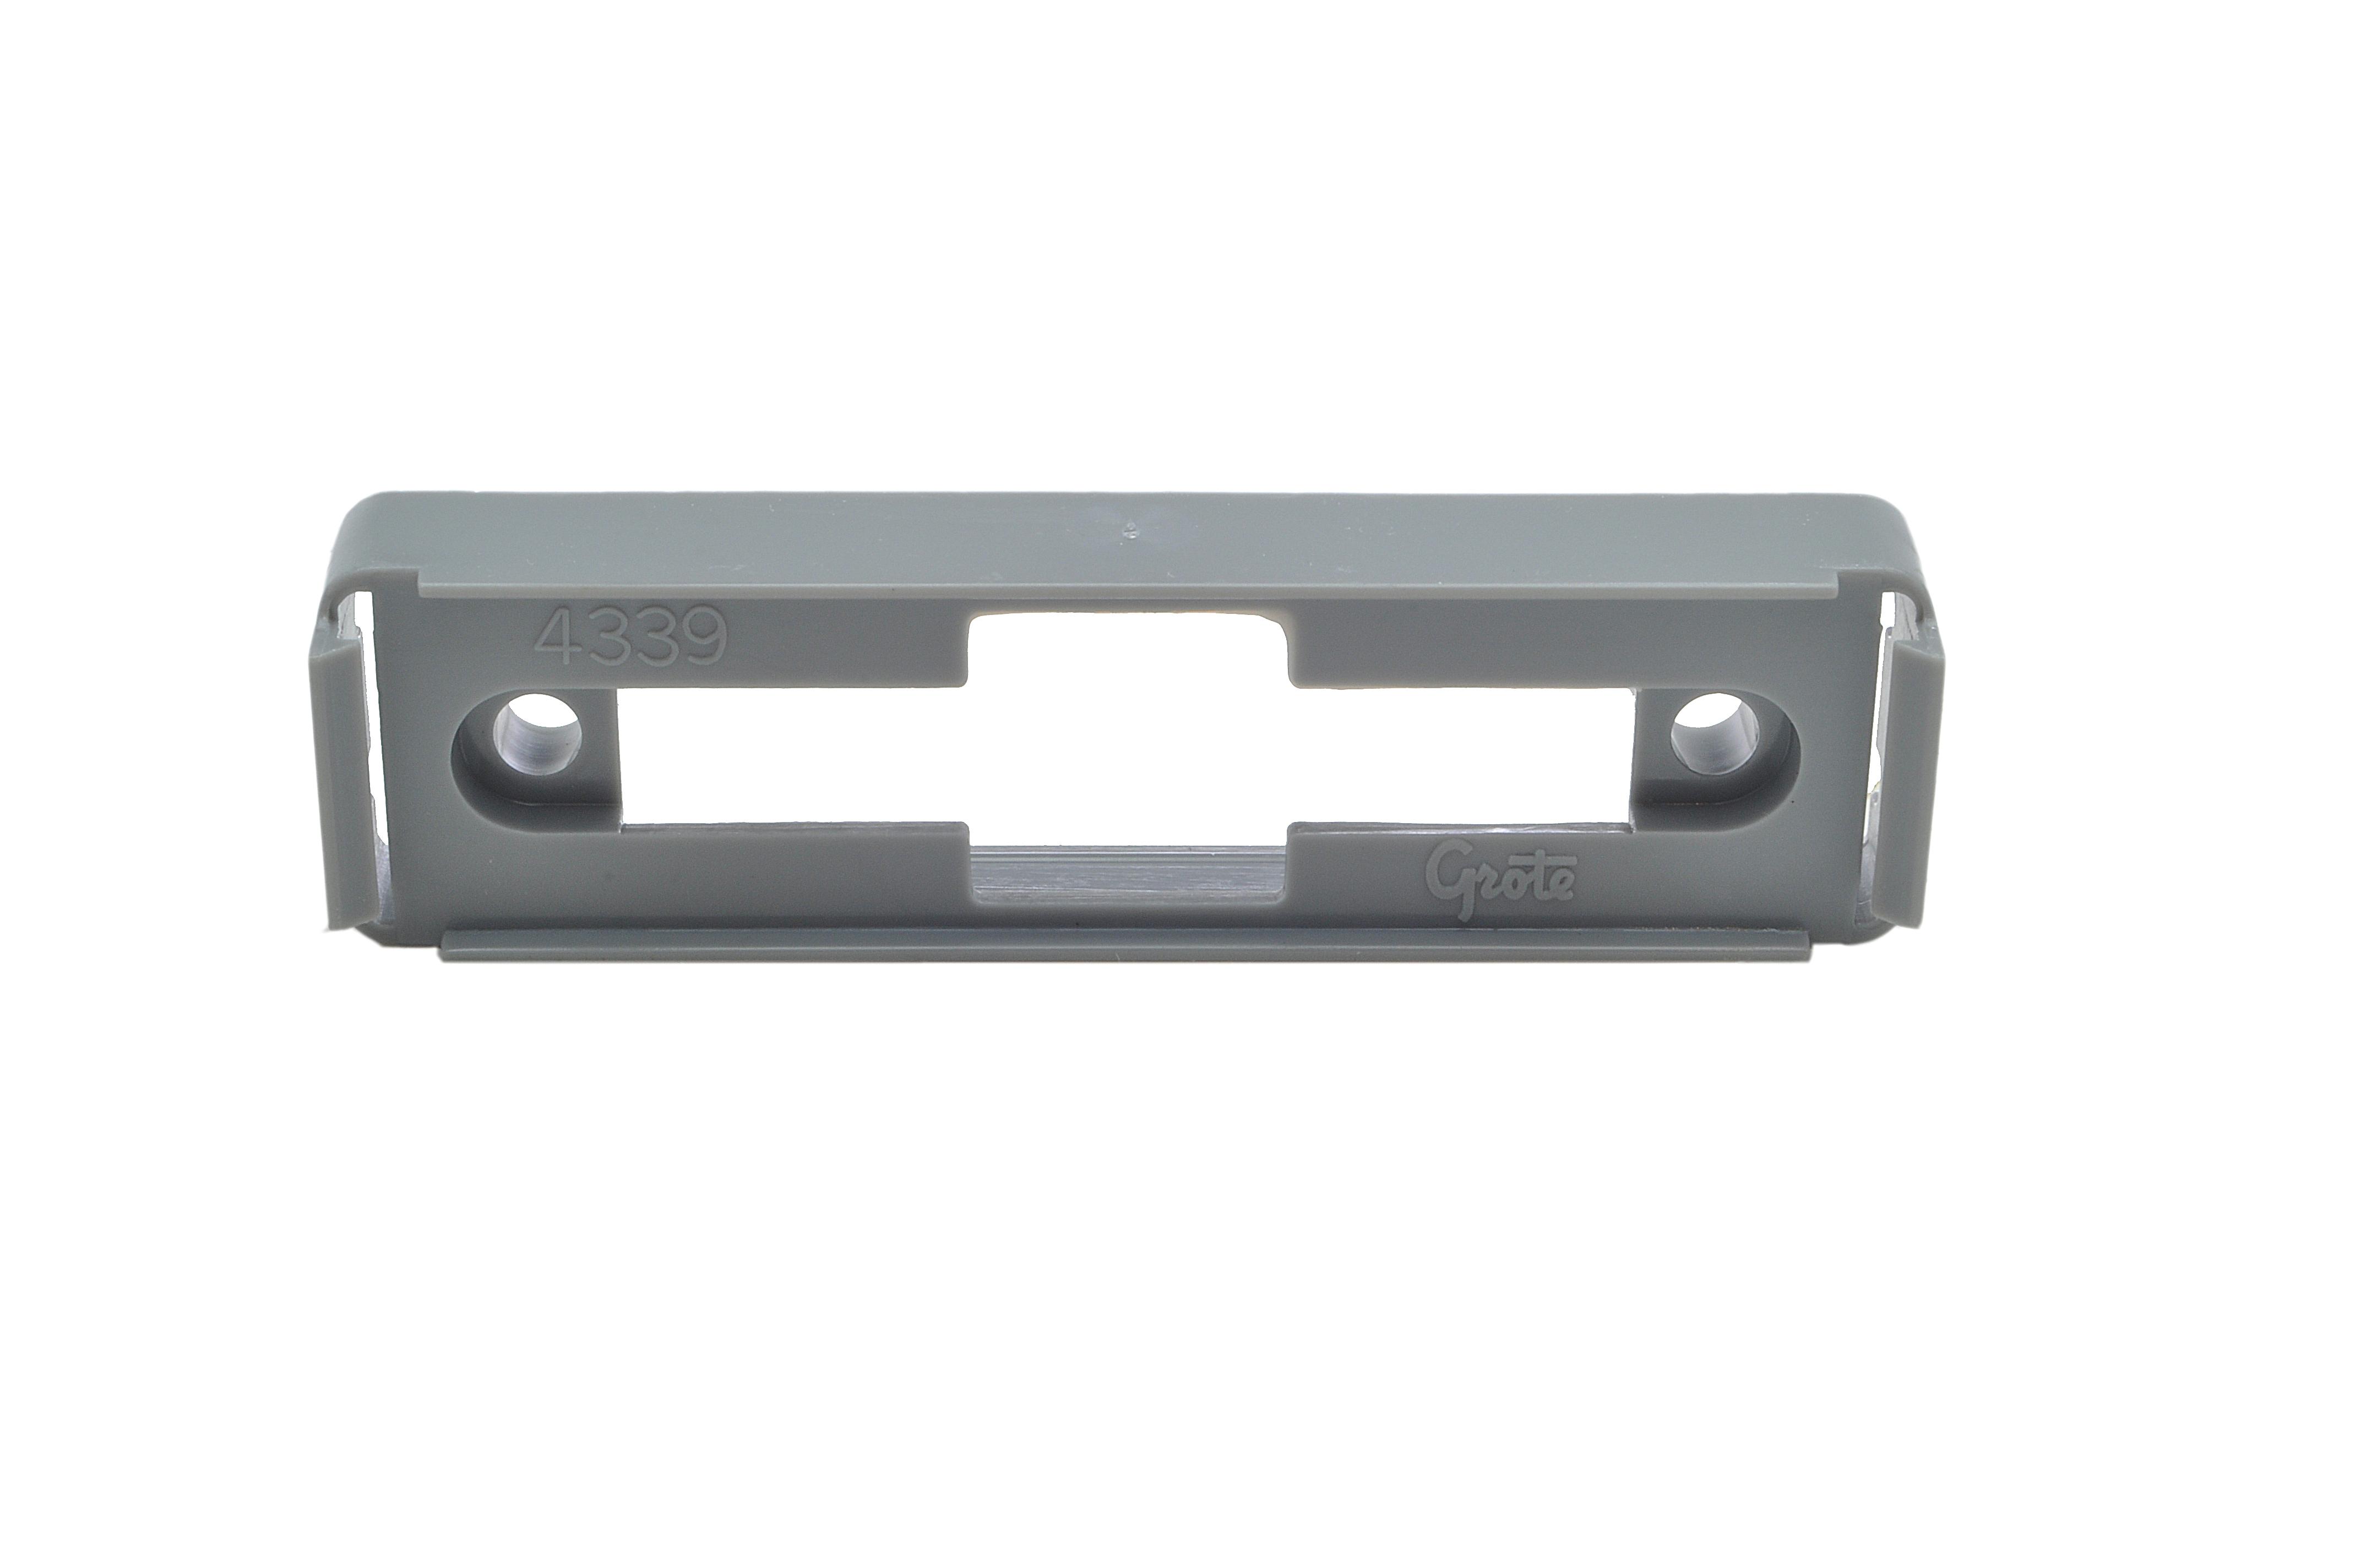 Mounting Bracket For Large Rectangular Lights, Gray - 360